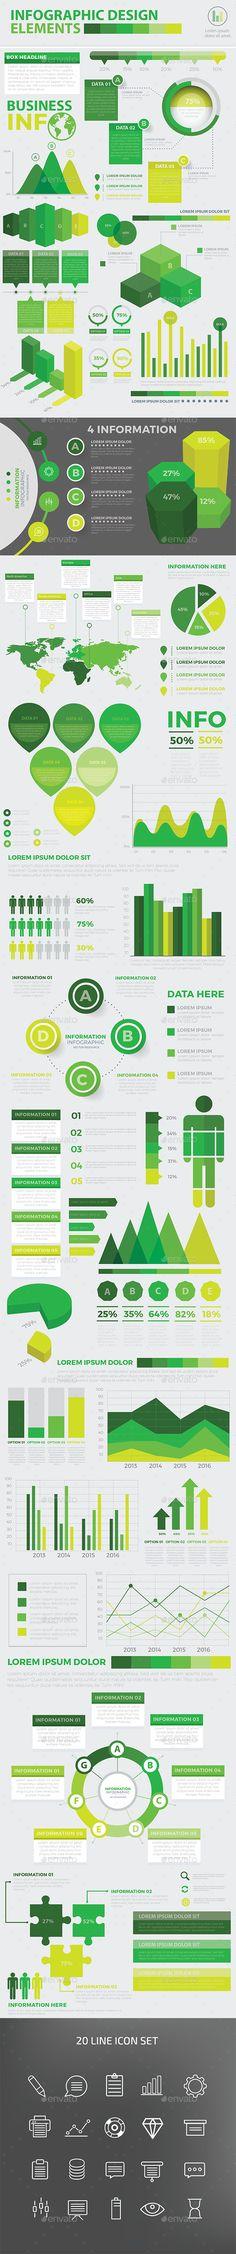 Modern Infographic Elements Design Templates Vector EPS, AI Illustrator. Download here: http://graphicriver.net/item/modern-infographic-elements-design/16724024?ref=ksioks